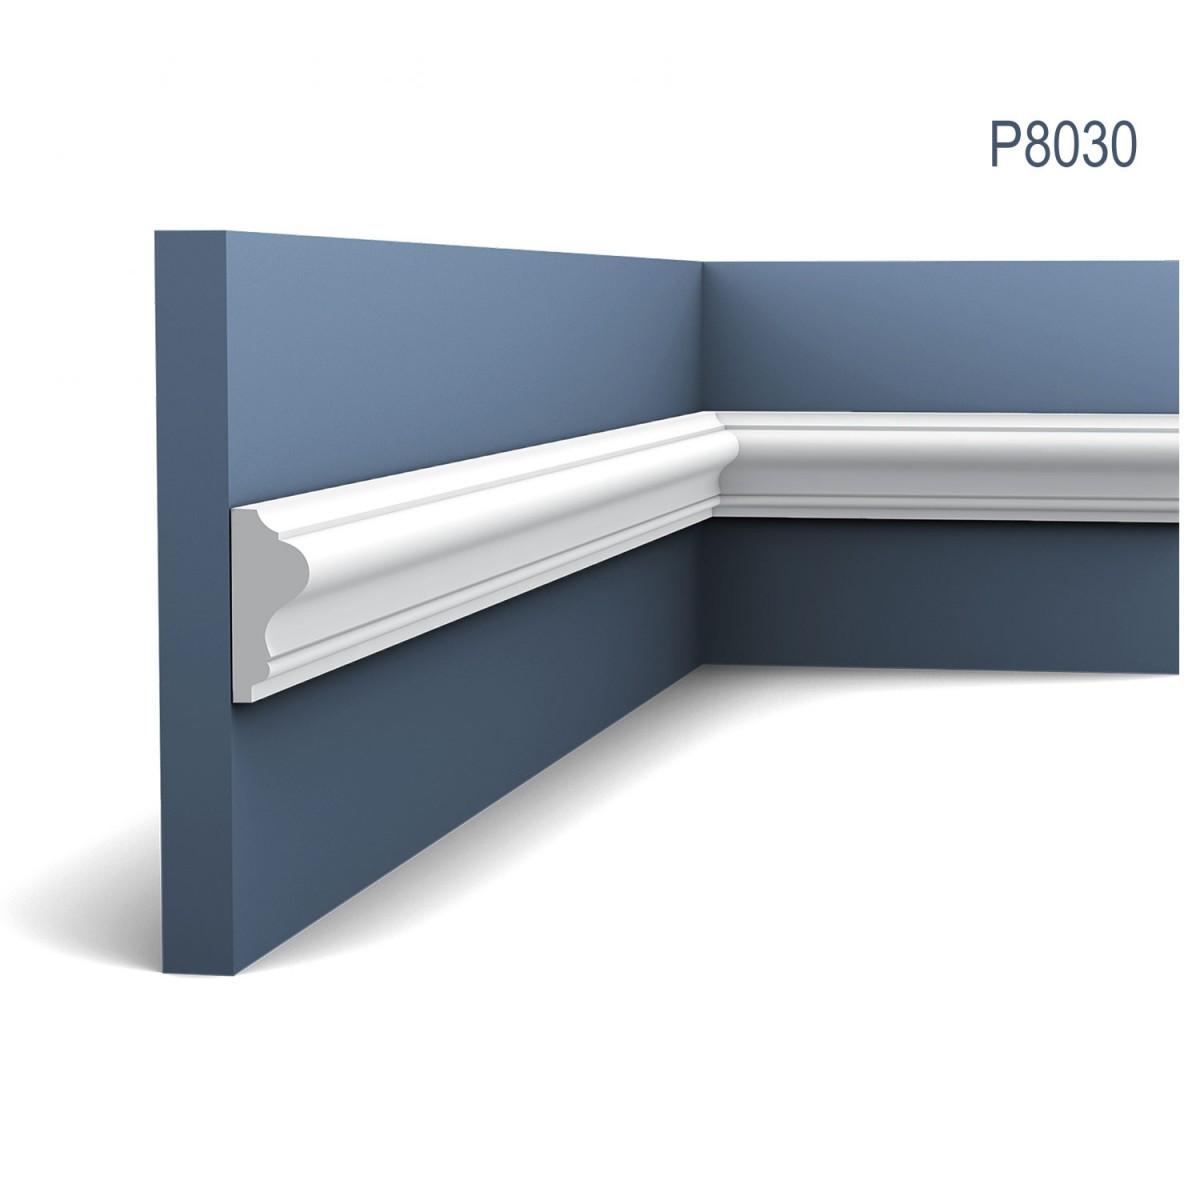 Brau Luxxus P8030, Dimensiuni: 200 X 4.1 X 1.7 cm, Orac Decor